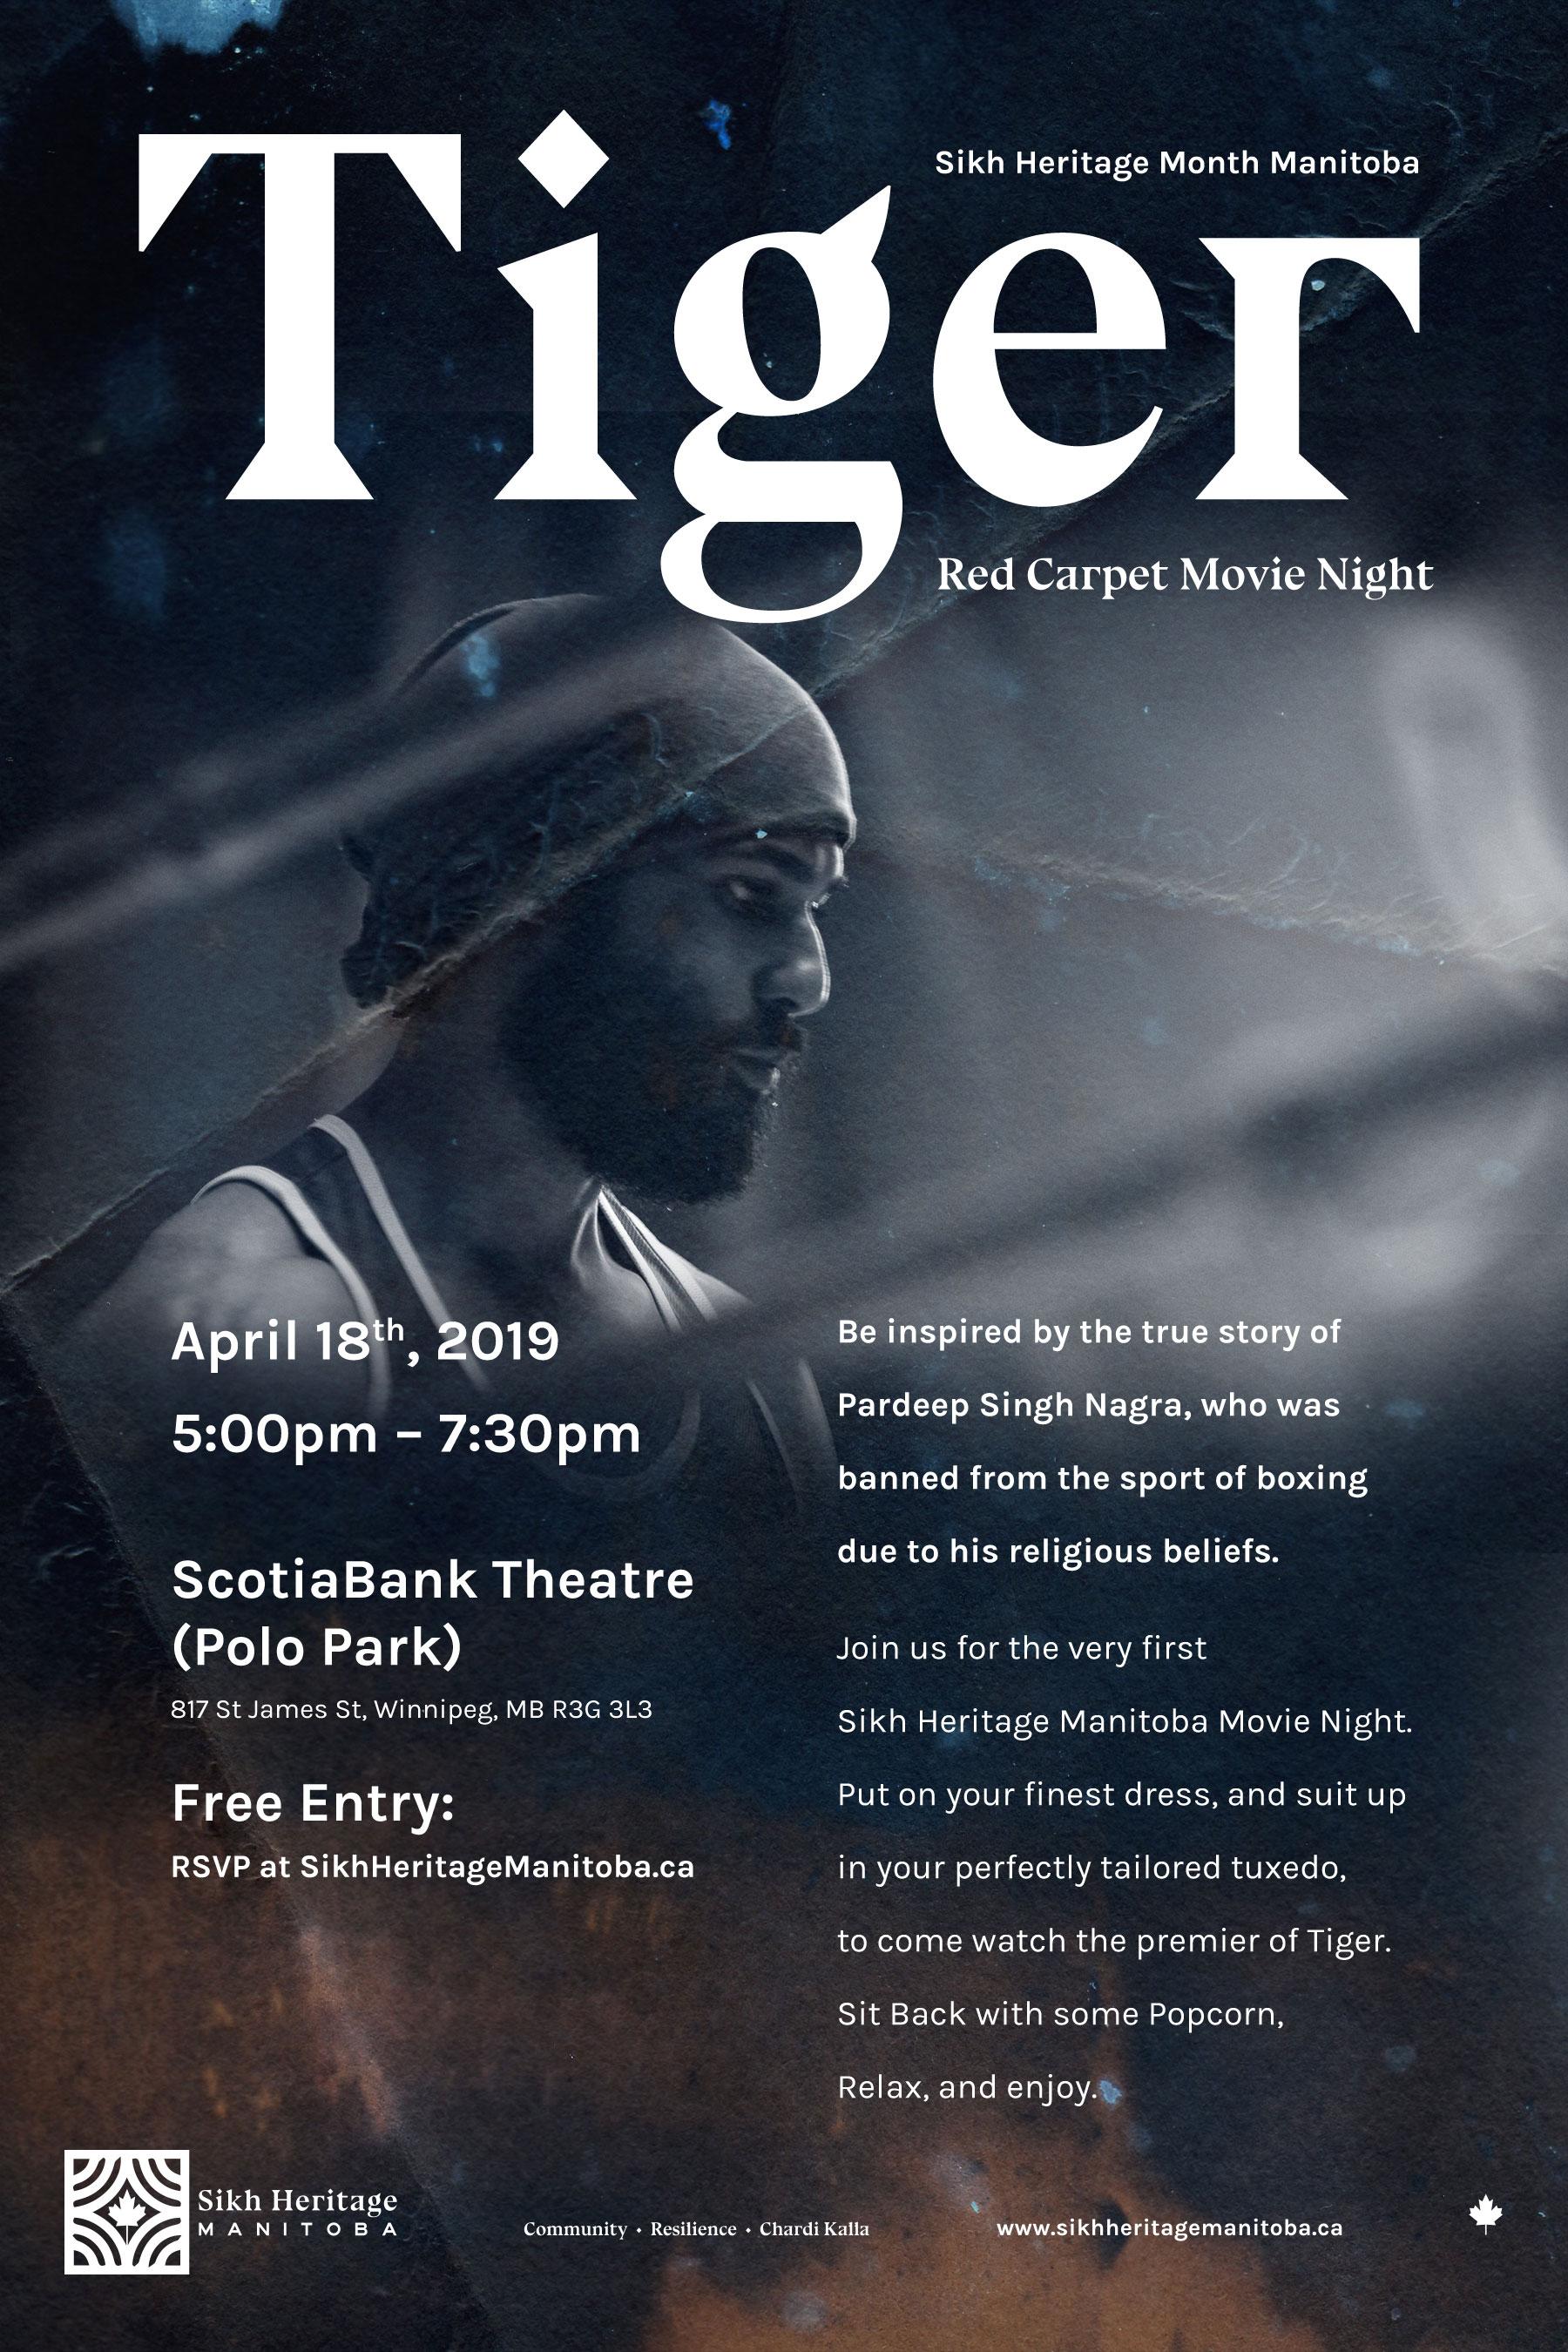 SHM-Events-Tiger-March11-2019.jpg